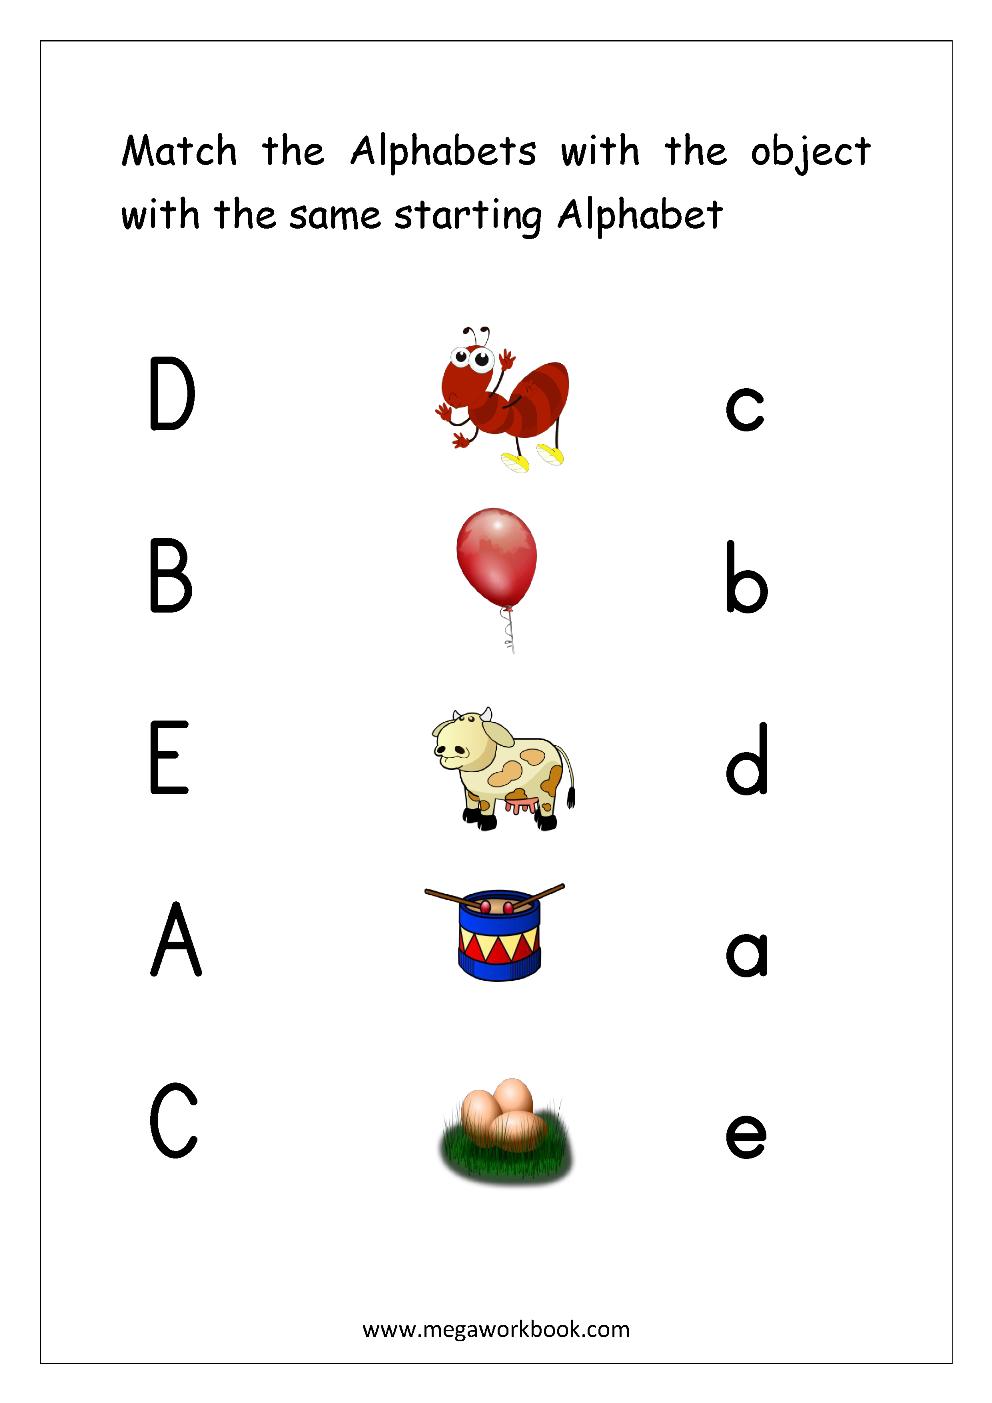 Free English Worksheets - Alphabet Matching - Megaworkbook in Alphabet Worksheets Matching